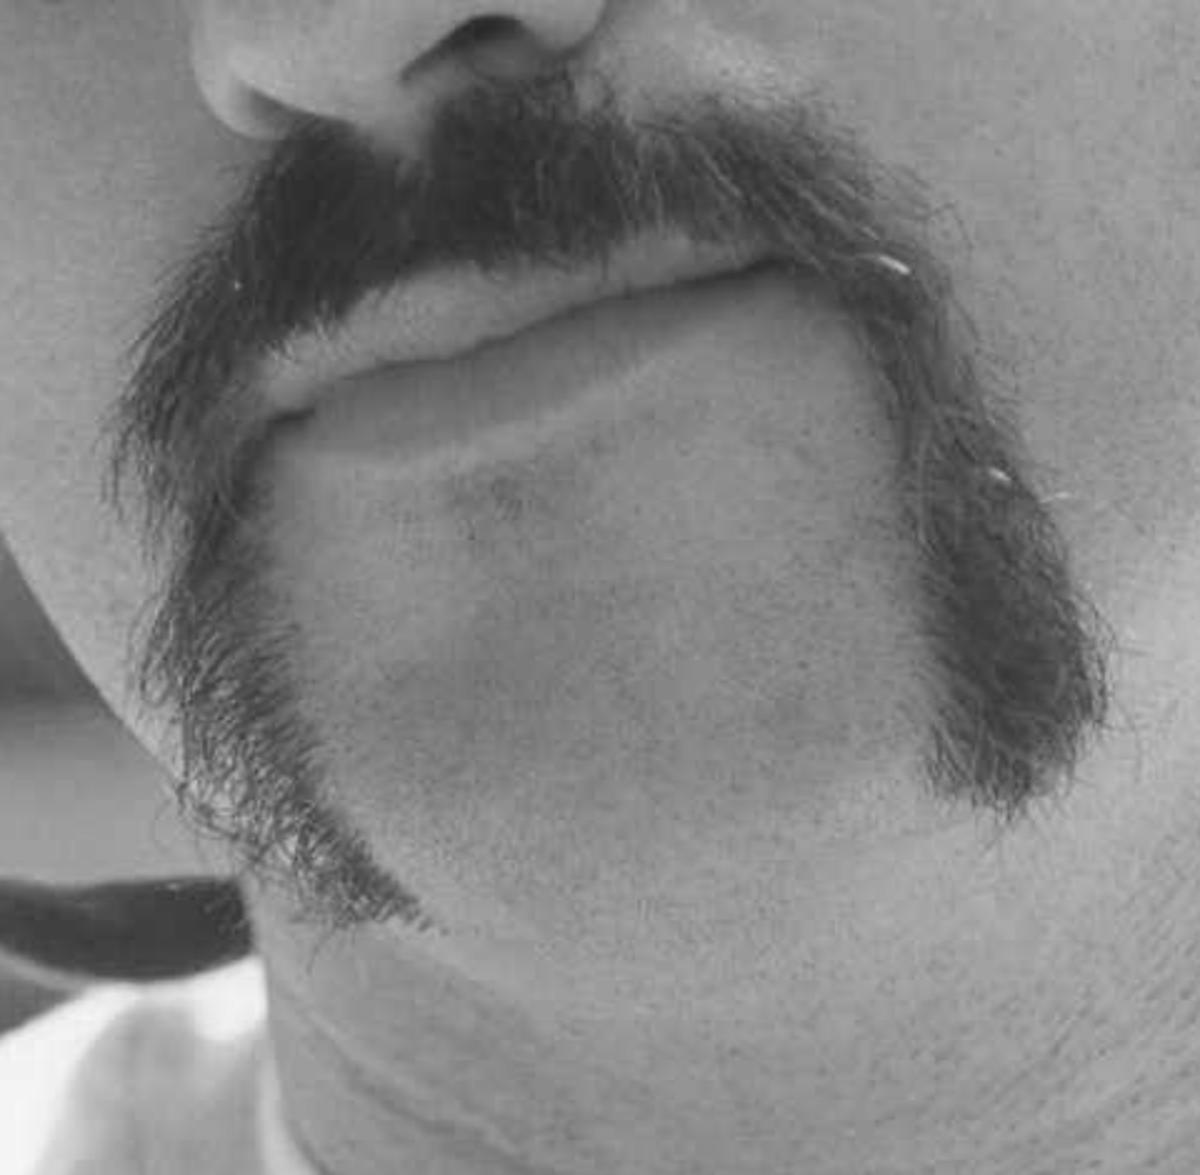 The horseshoe mustache.